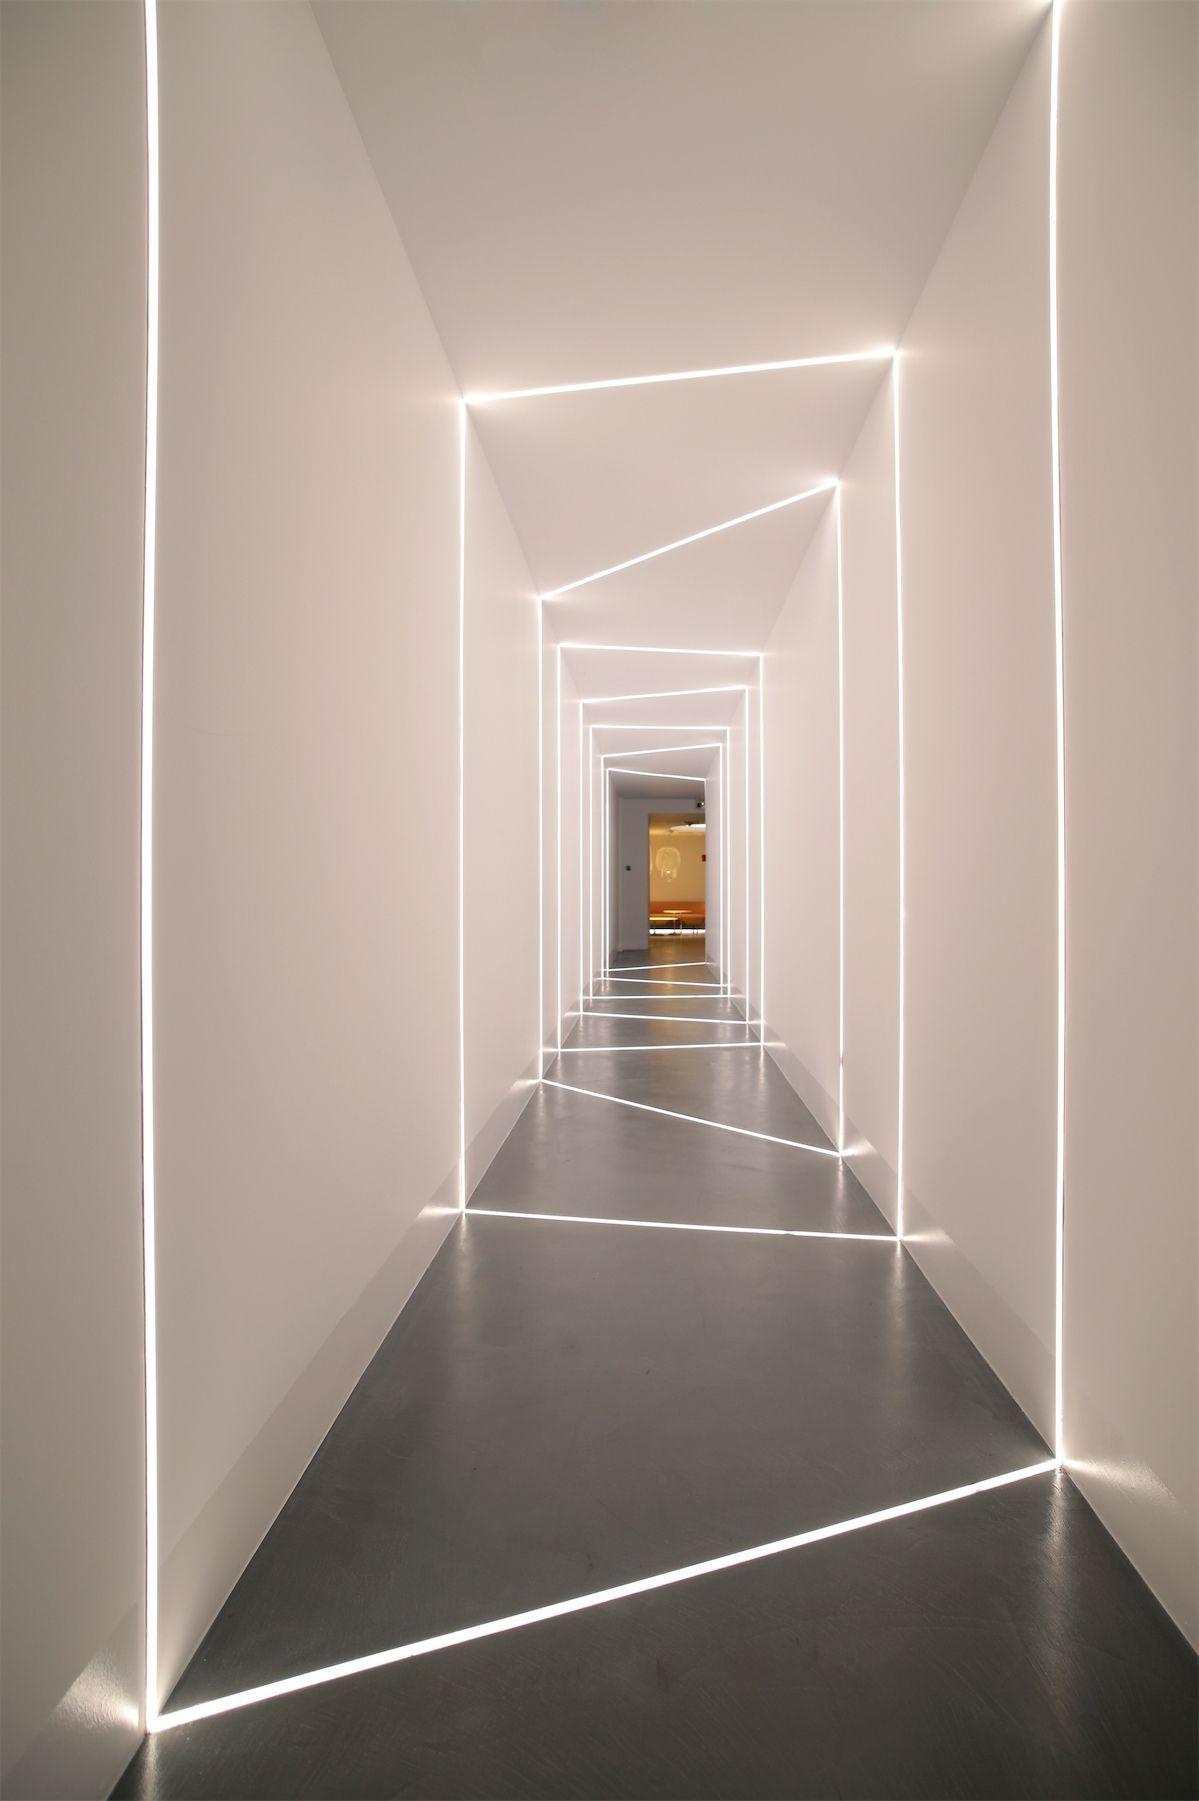 Natural office lighting Artificial Lighting Image Result For Natural Light Corridors Pinterest Image Result For Natural Light Corridors Architecture Lighting